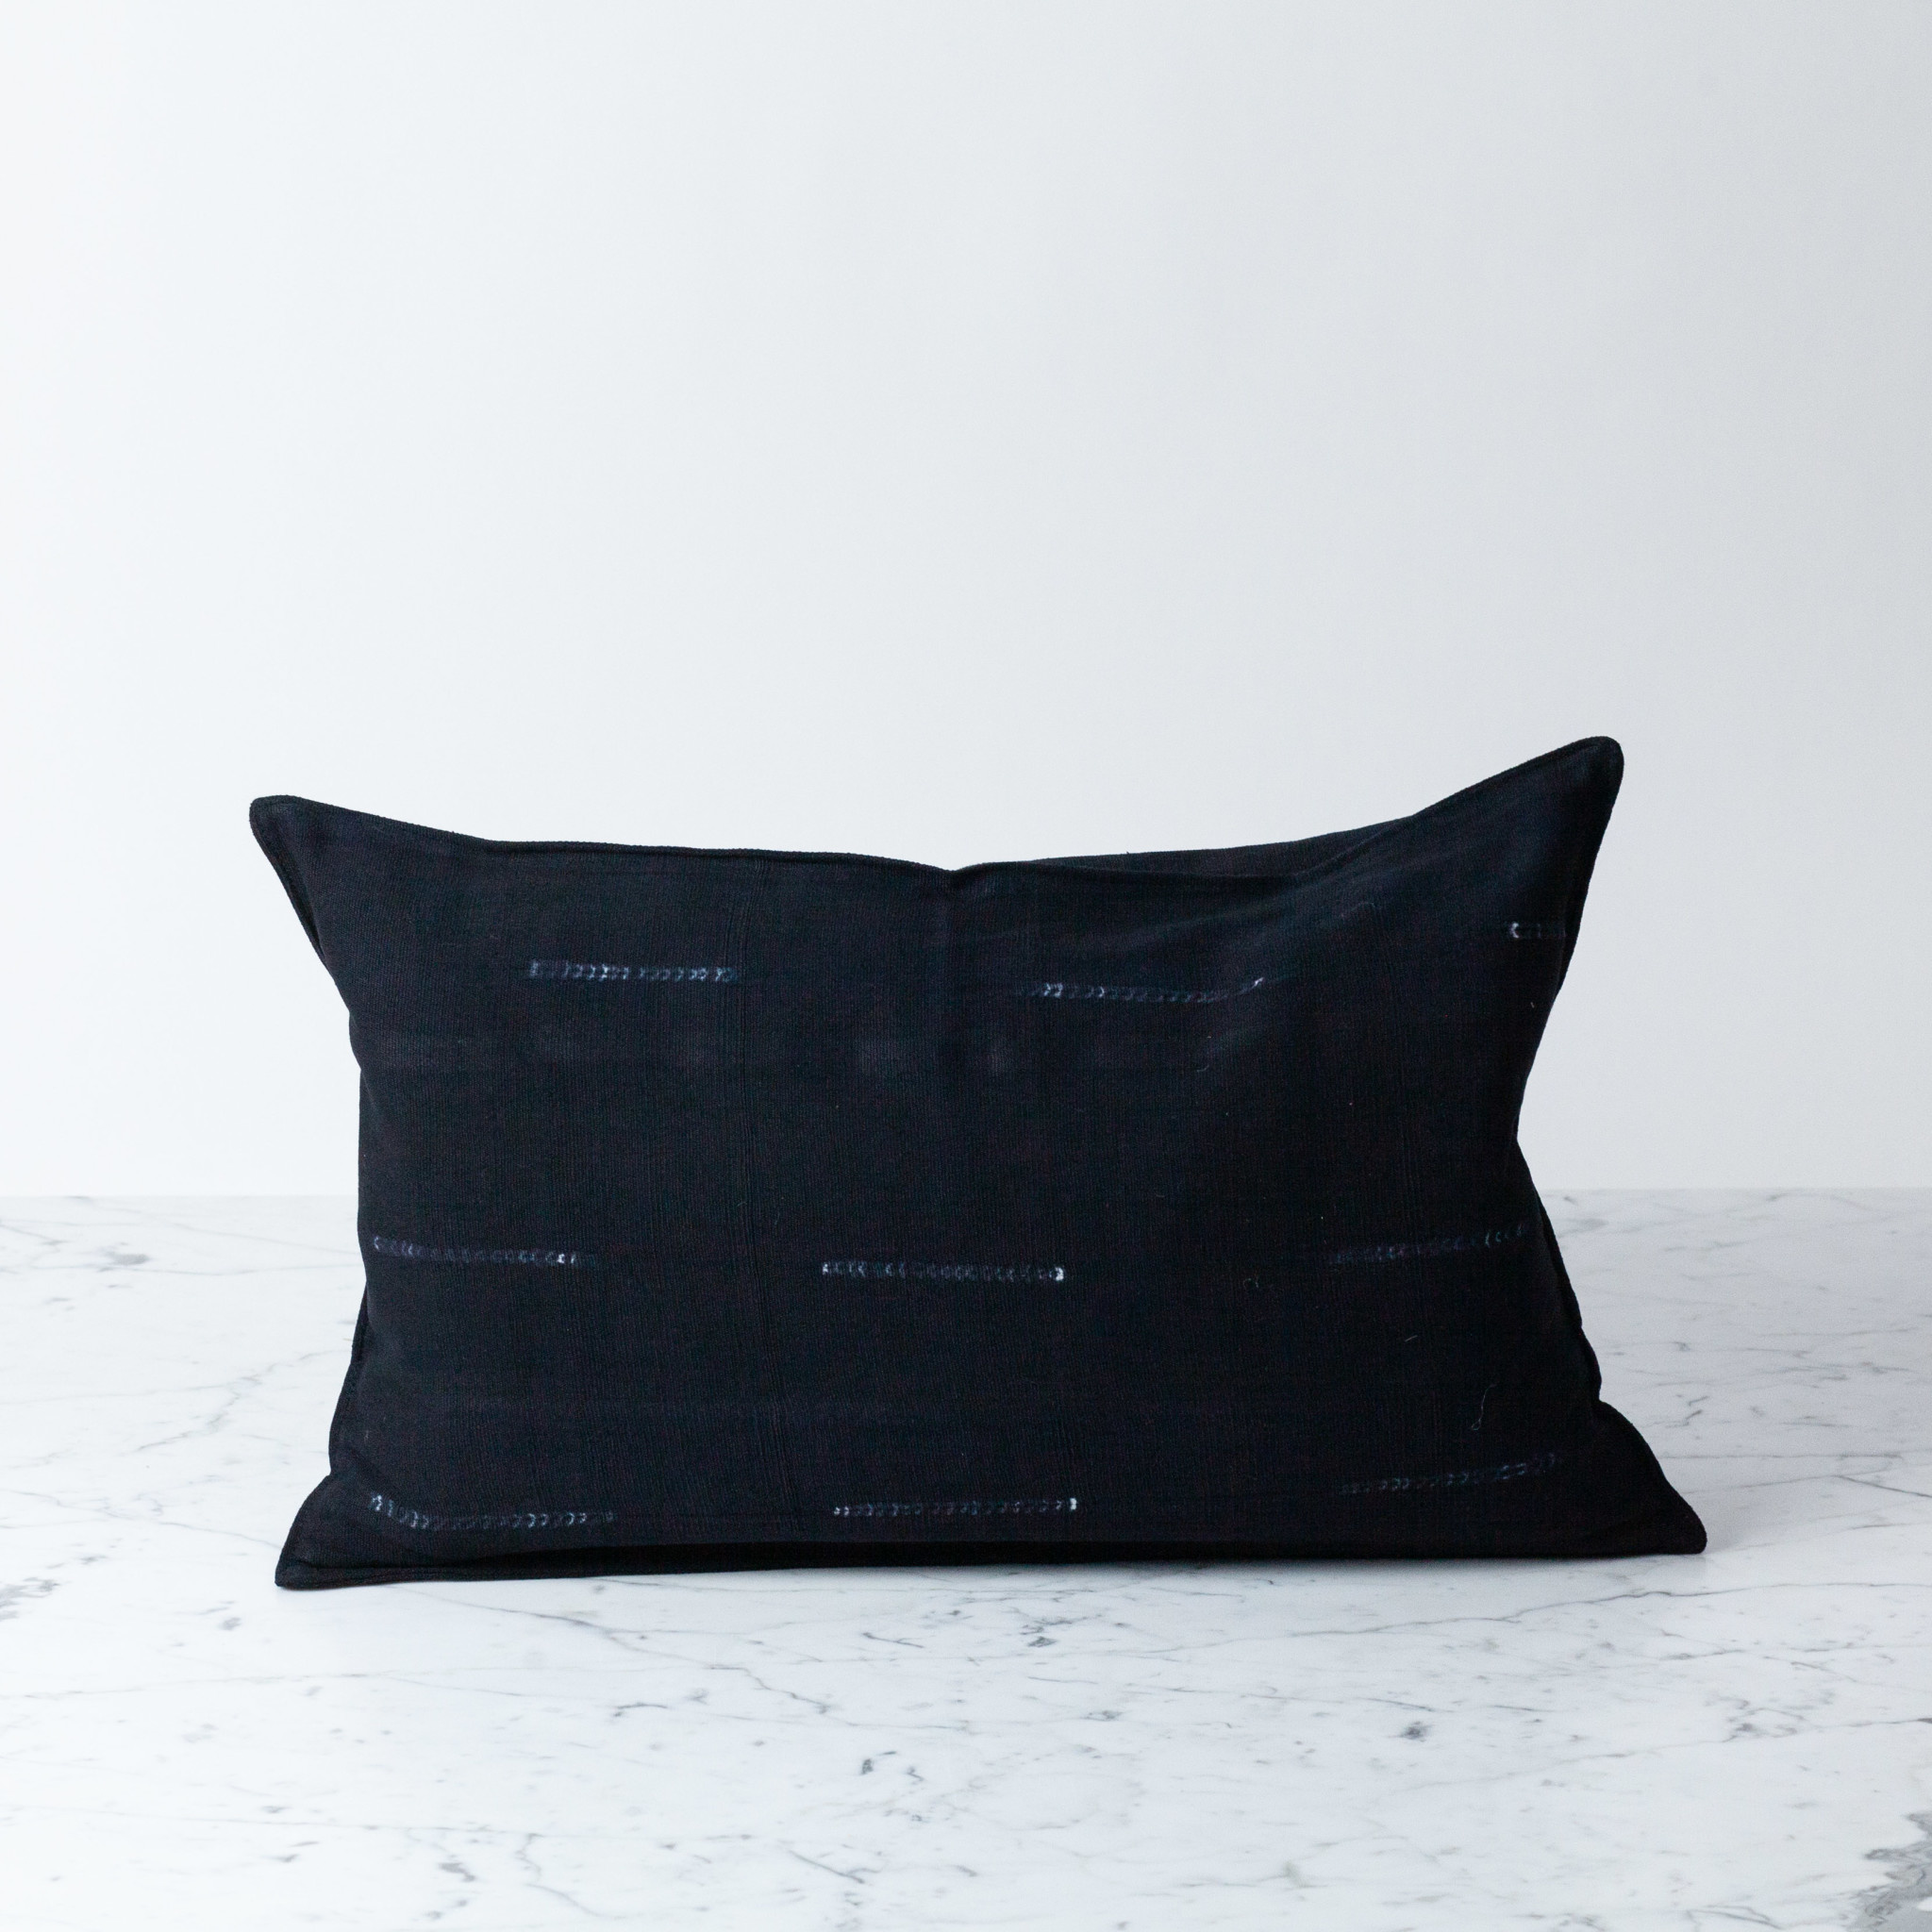 "TENSIRA 12 x 20"" Handwoven Cotton Pillow with Down Insert - Button Closure - Black Delicate Stitch Dye Stripe"